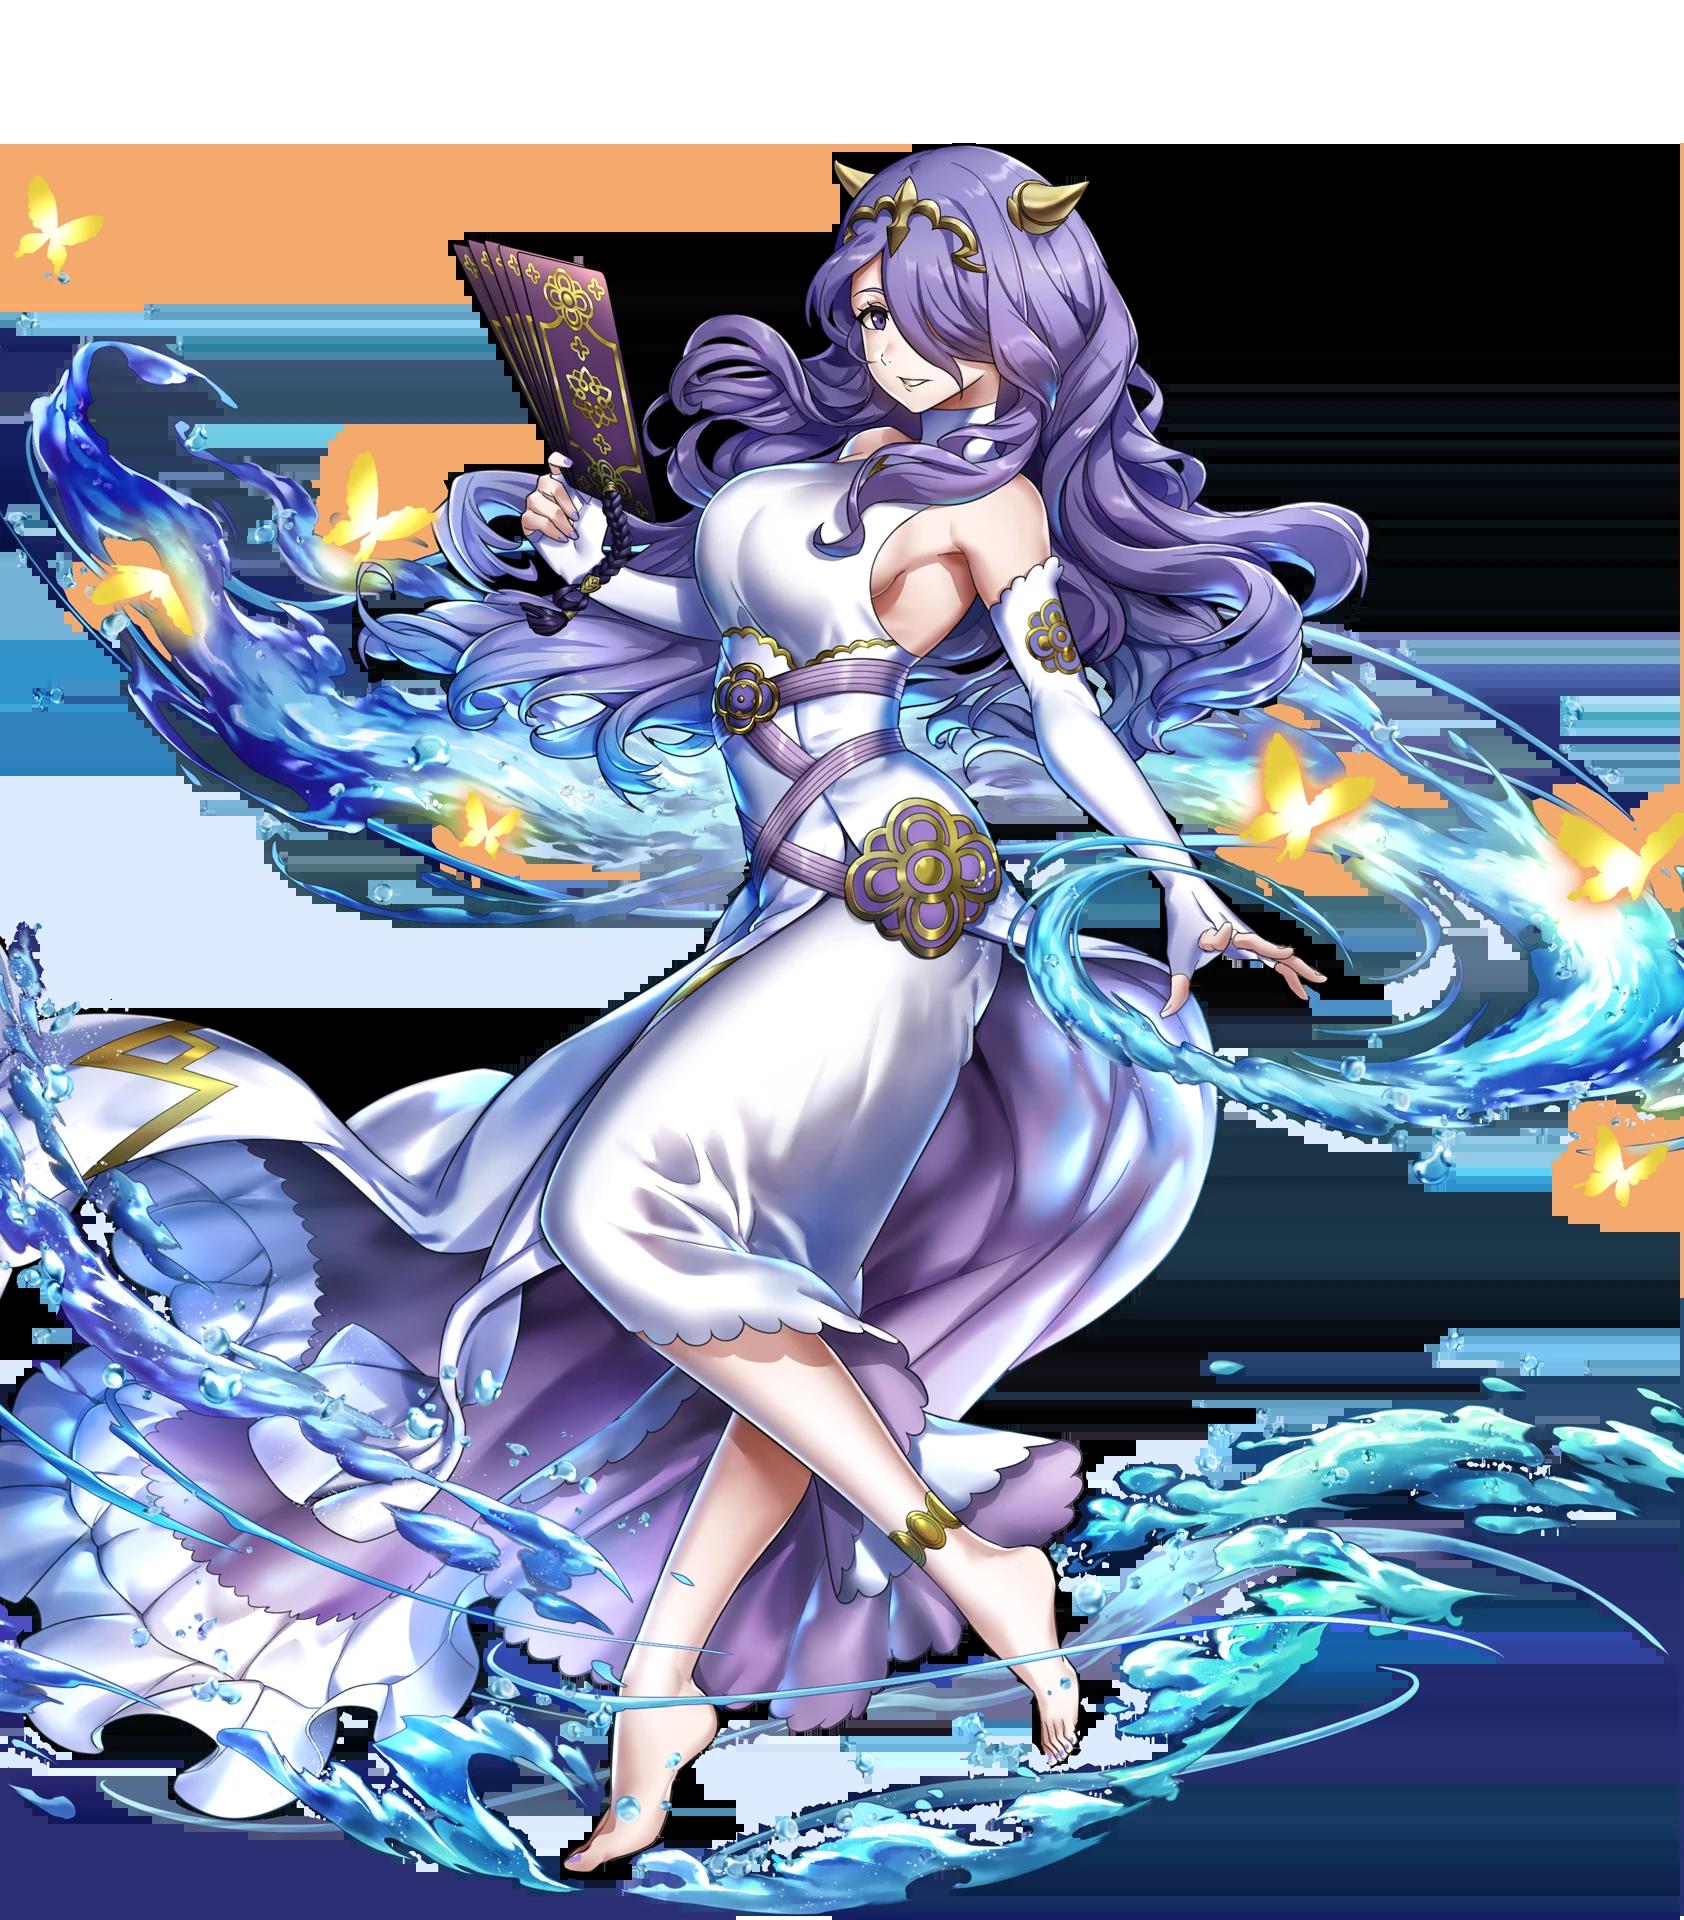 https://static.wikia.nocookie.net/feheroes_gamepedia_en/images/c/c5/Camilla_Flower_of_Fantasy_BtlFace_C.webp/revision/latest?cb=20190920221454&format=original